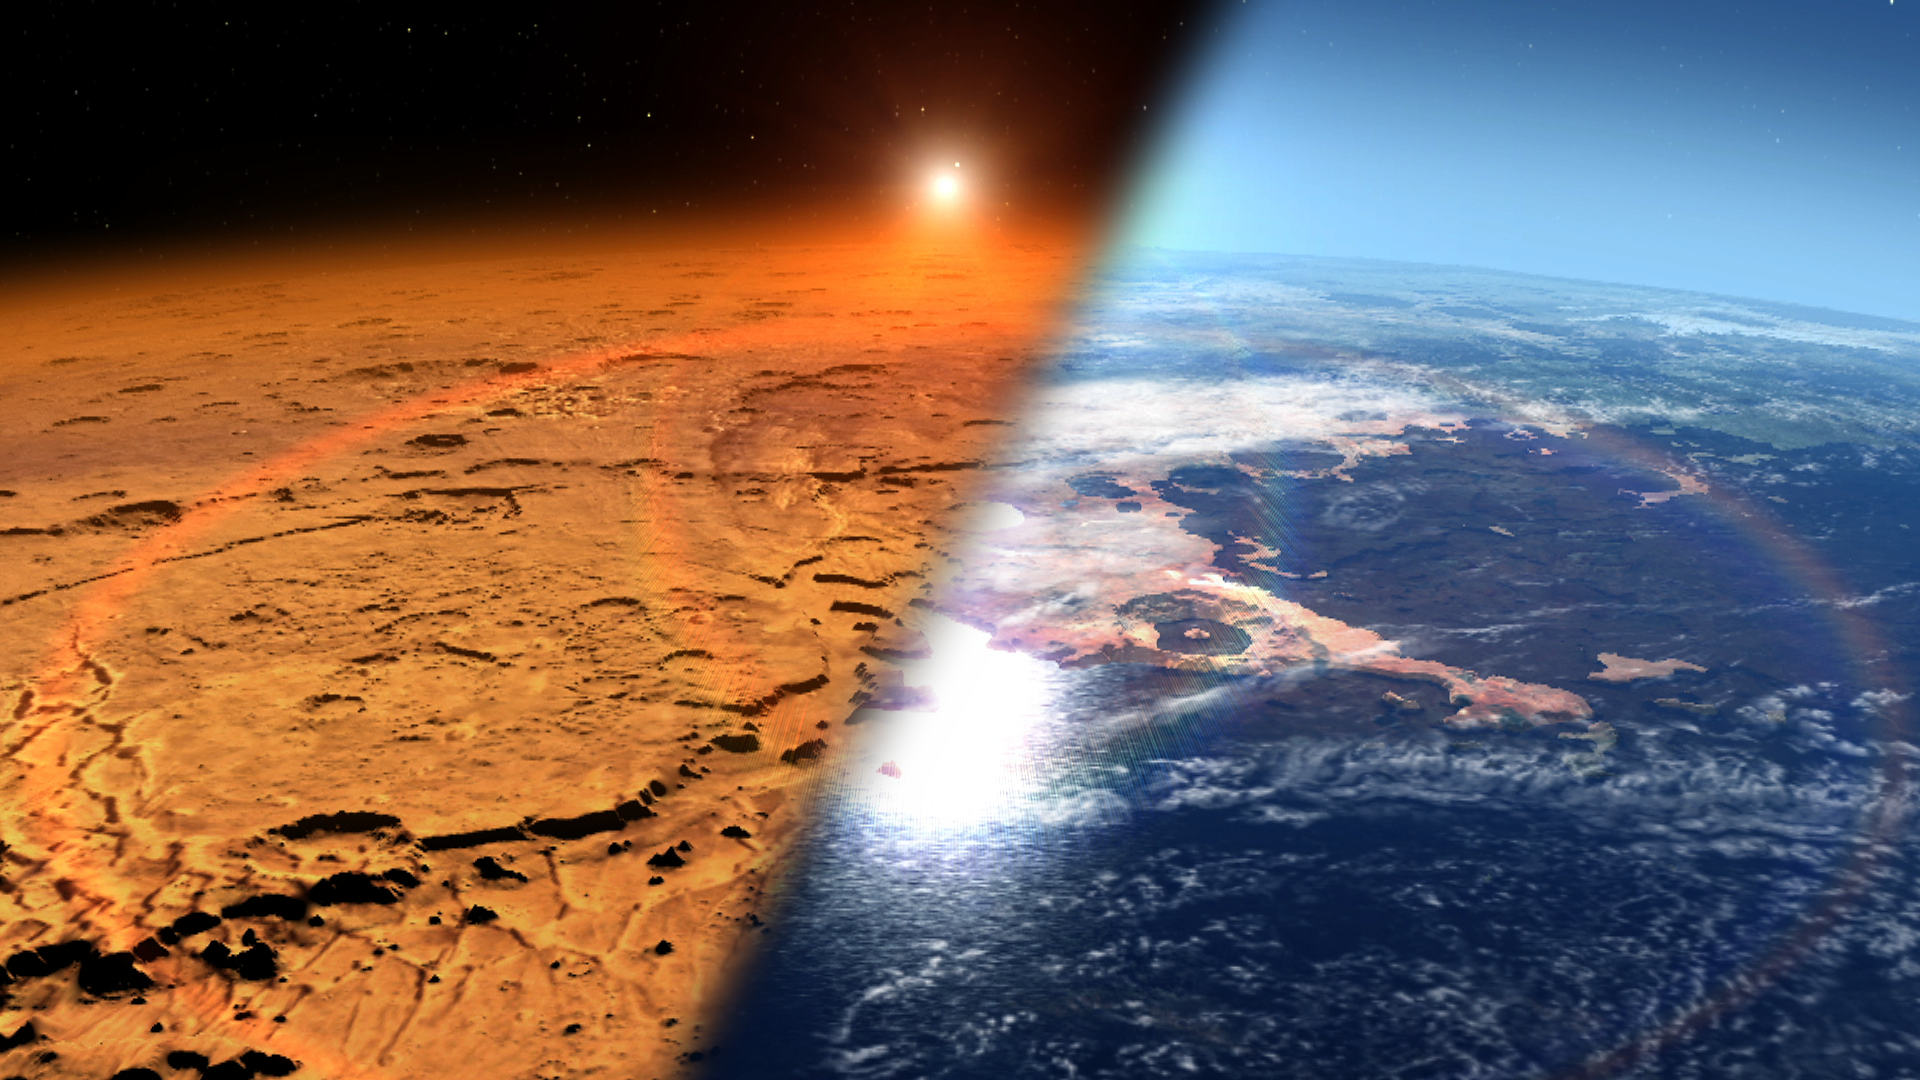 Image credit: NASA's Goddard Space Flight Center